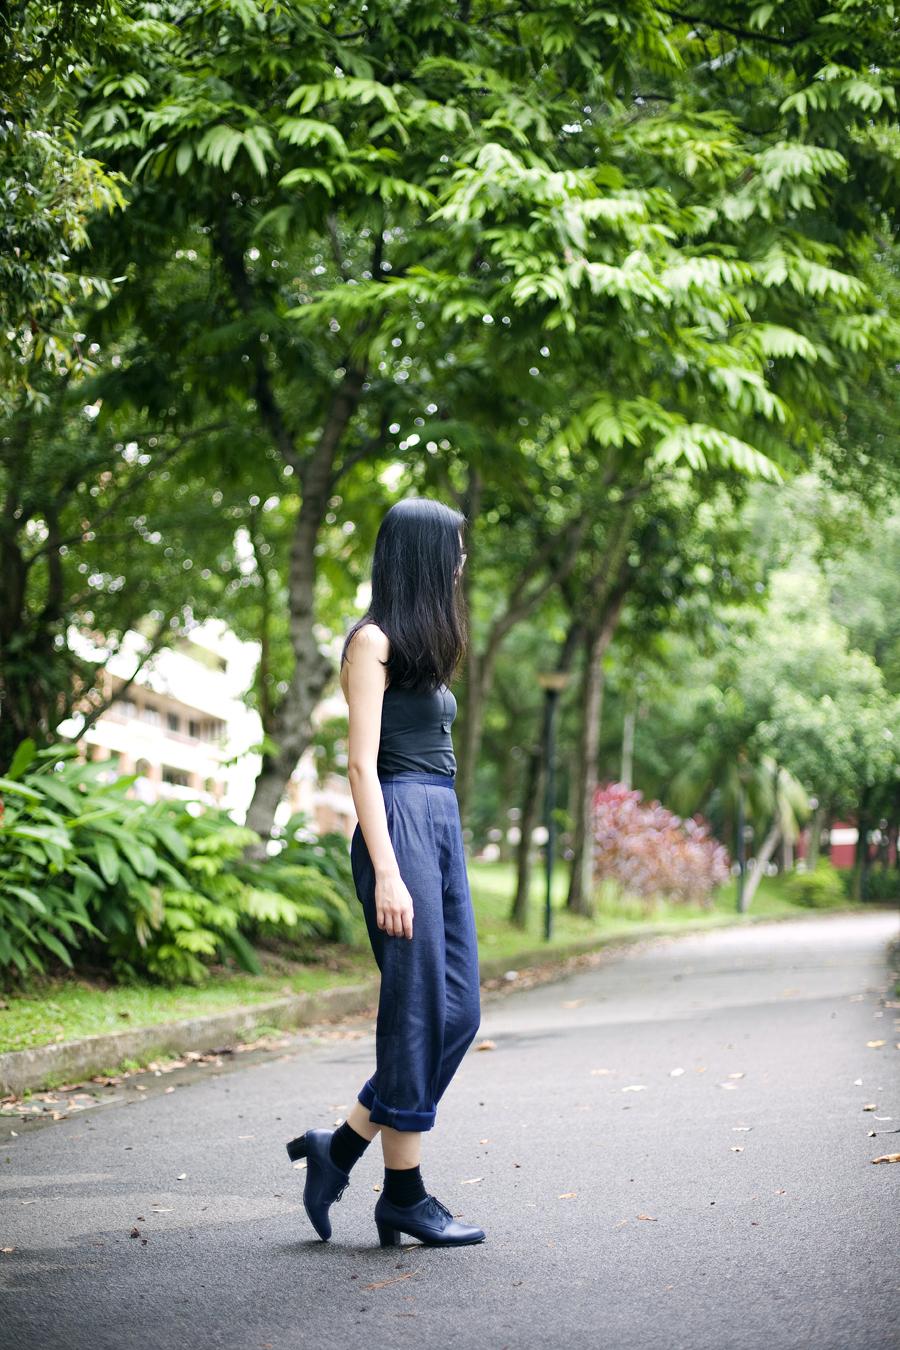 Outfit of the day (#ootd): Uniqlo black bratop, vintage navy pants, Taobao black socks, Taobao navy oxford heels, Gap black rim glasses, black square pendant necklace from Bangkok.